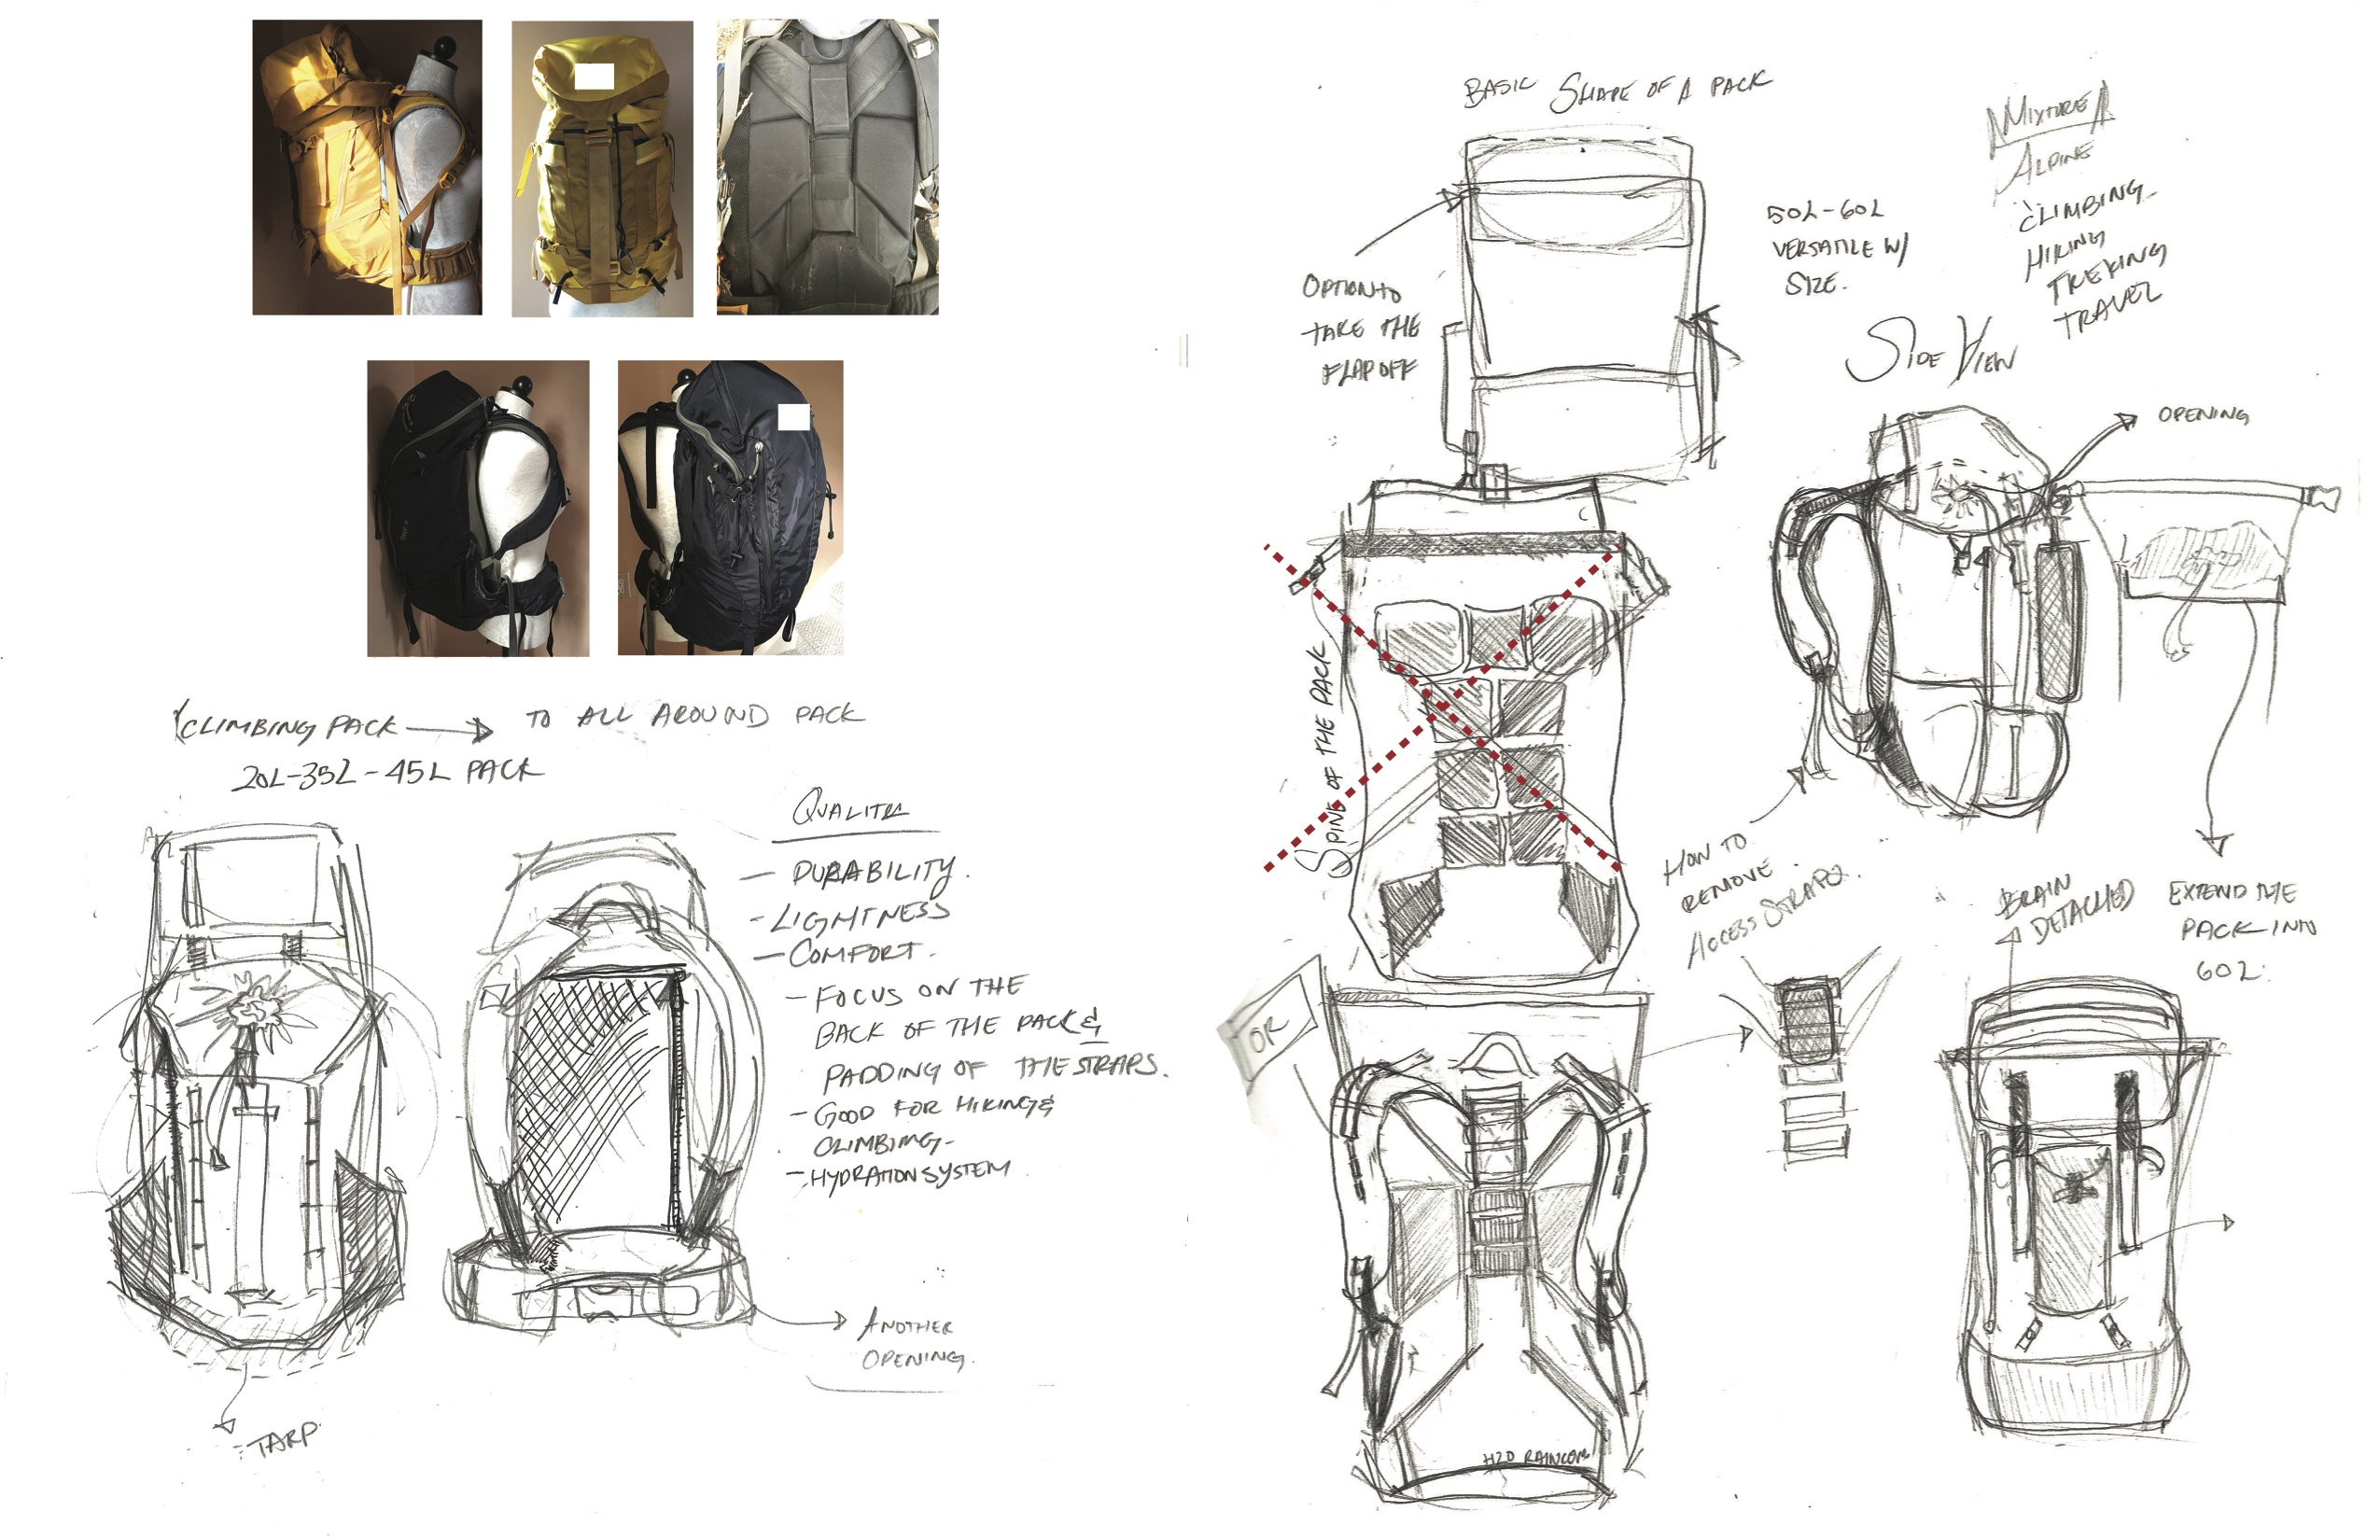 hikingpacktechpack 1